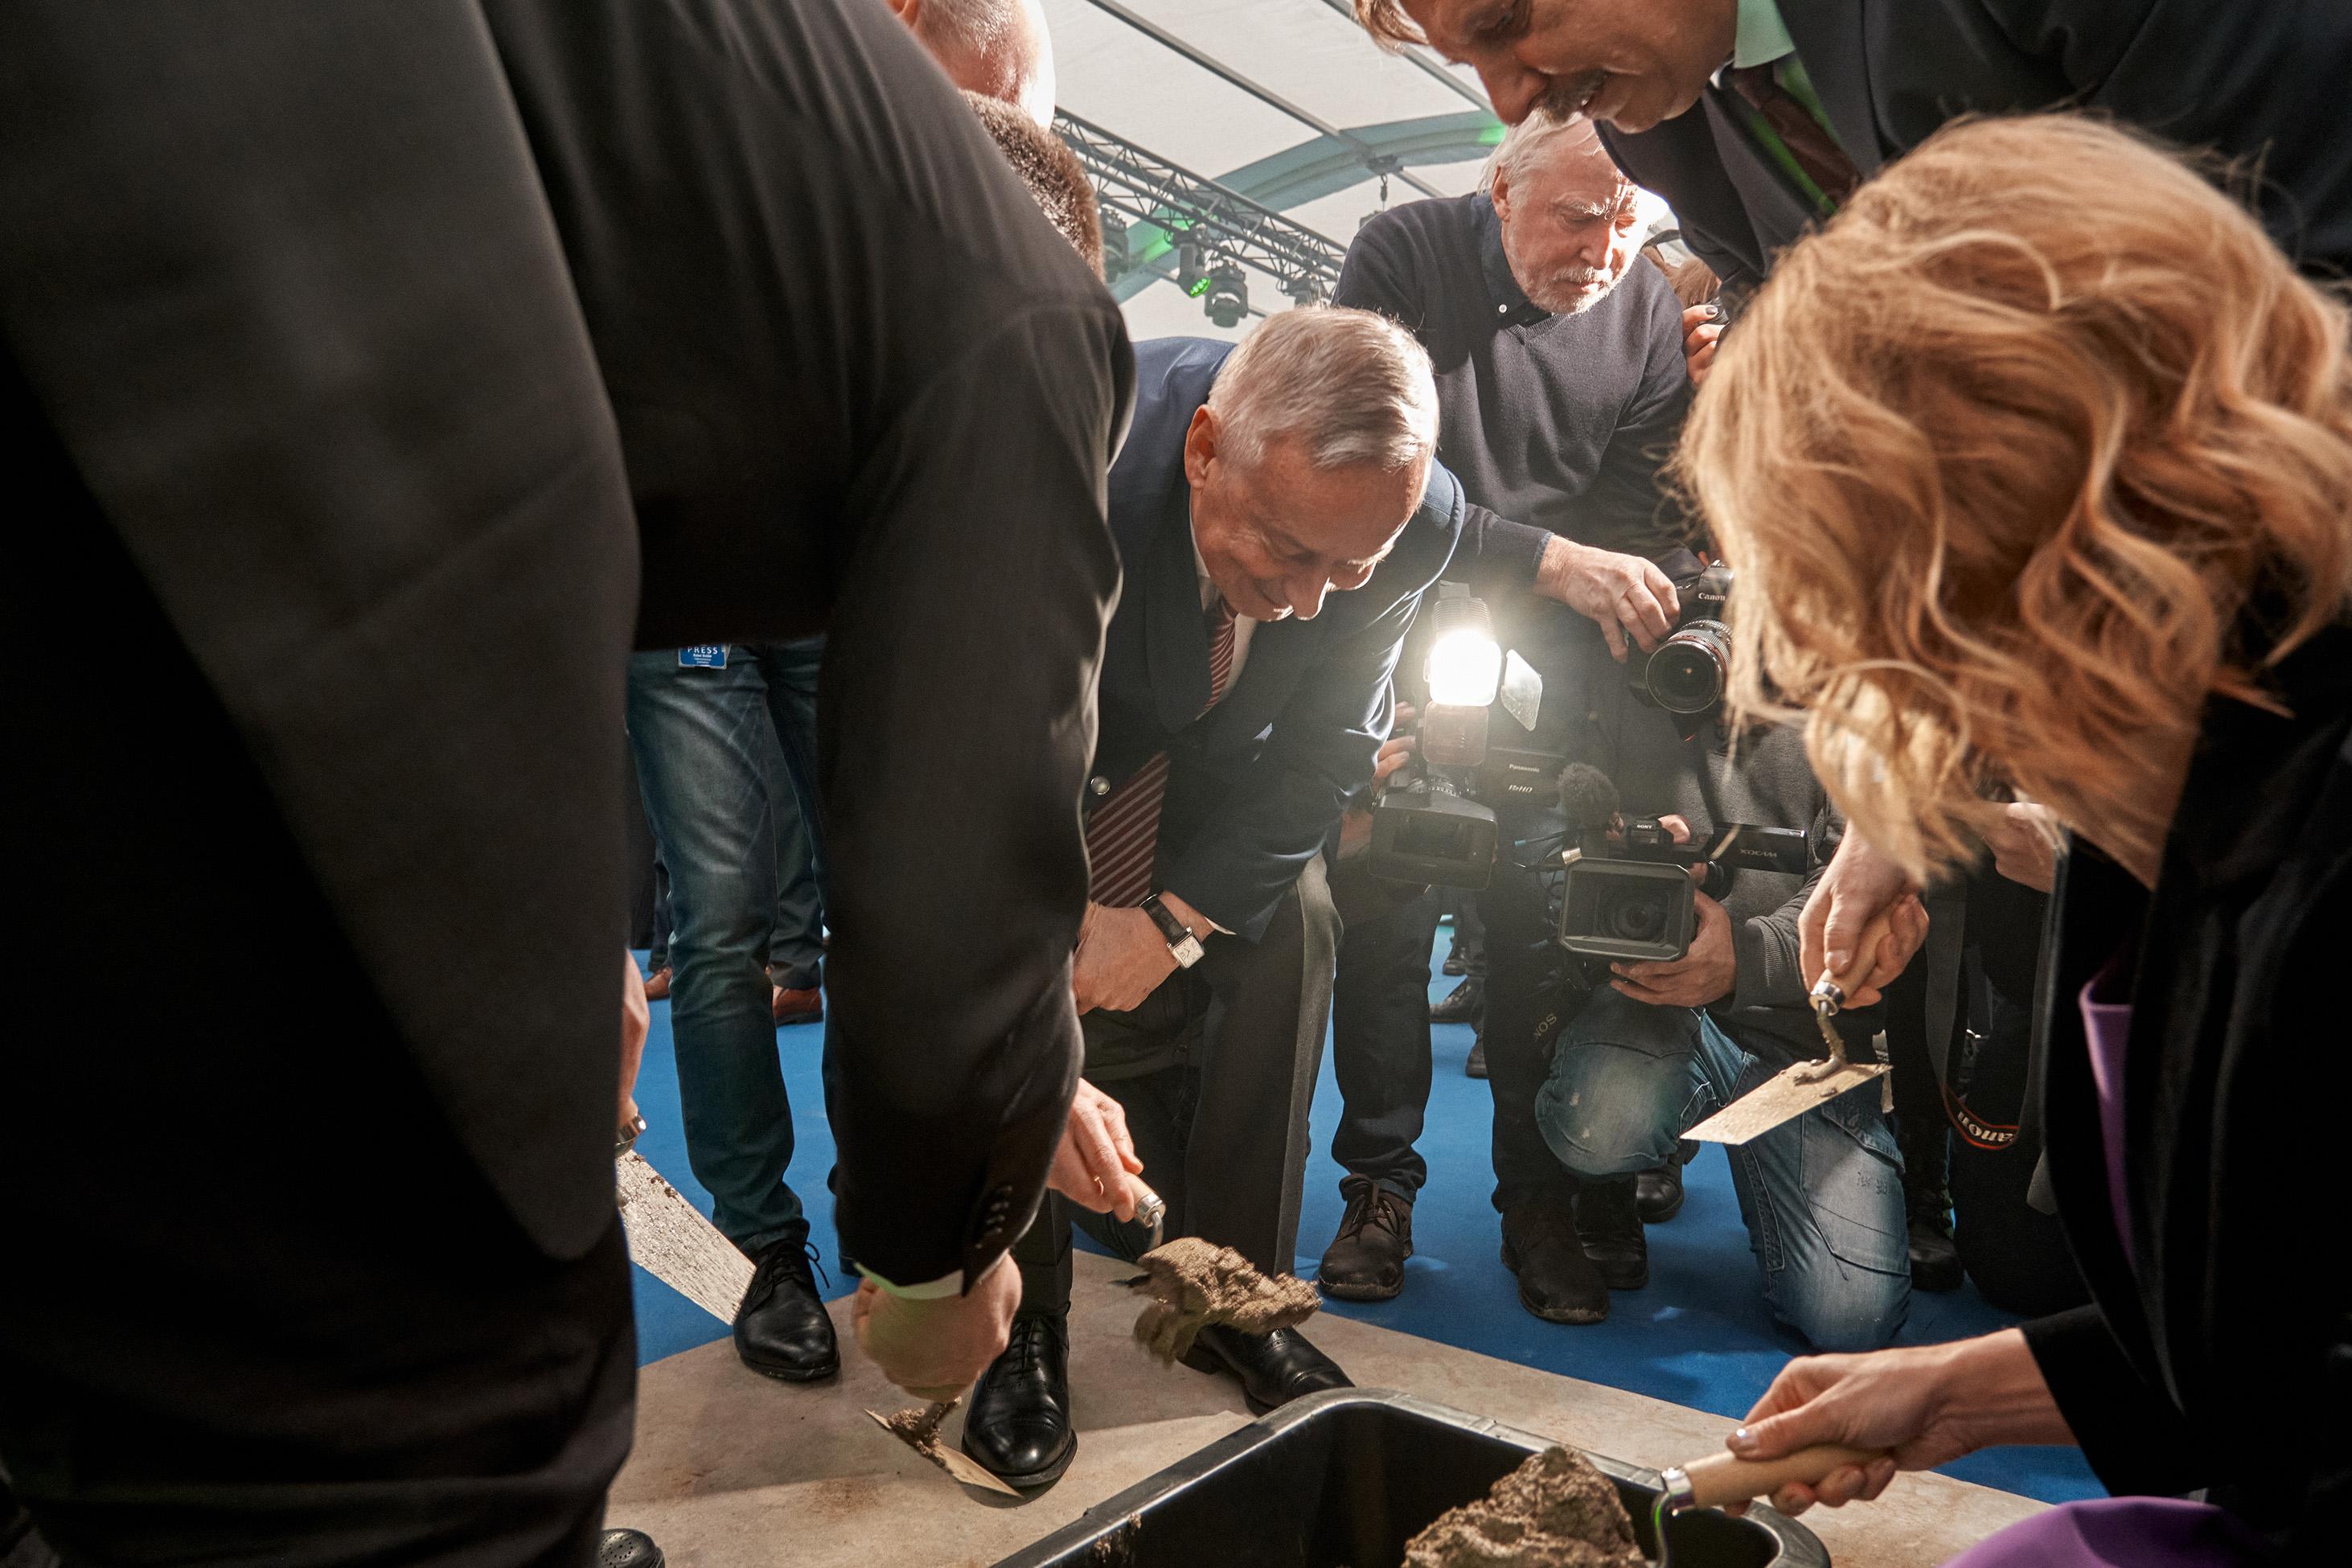 Rail Baltica construction begins in Estonia